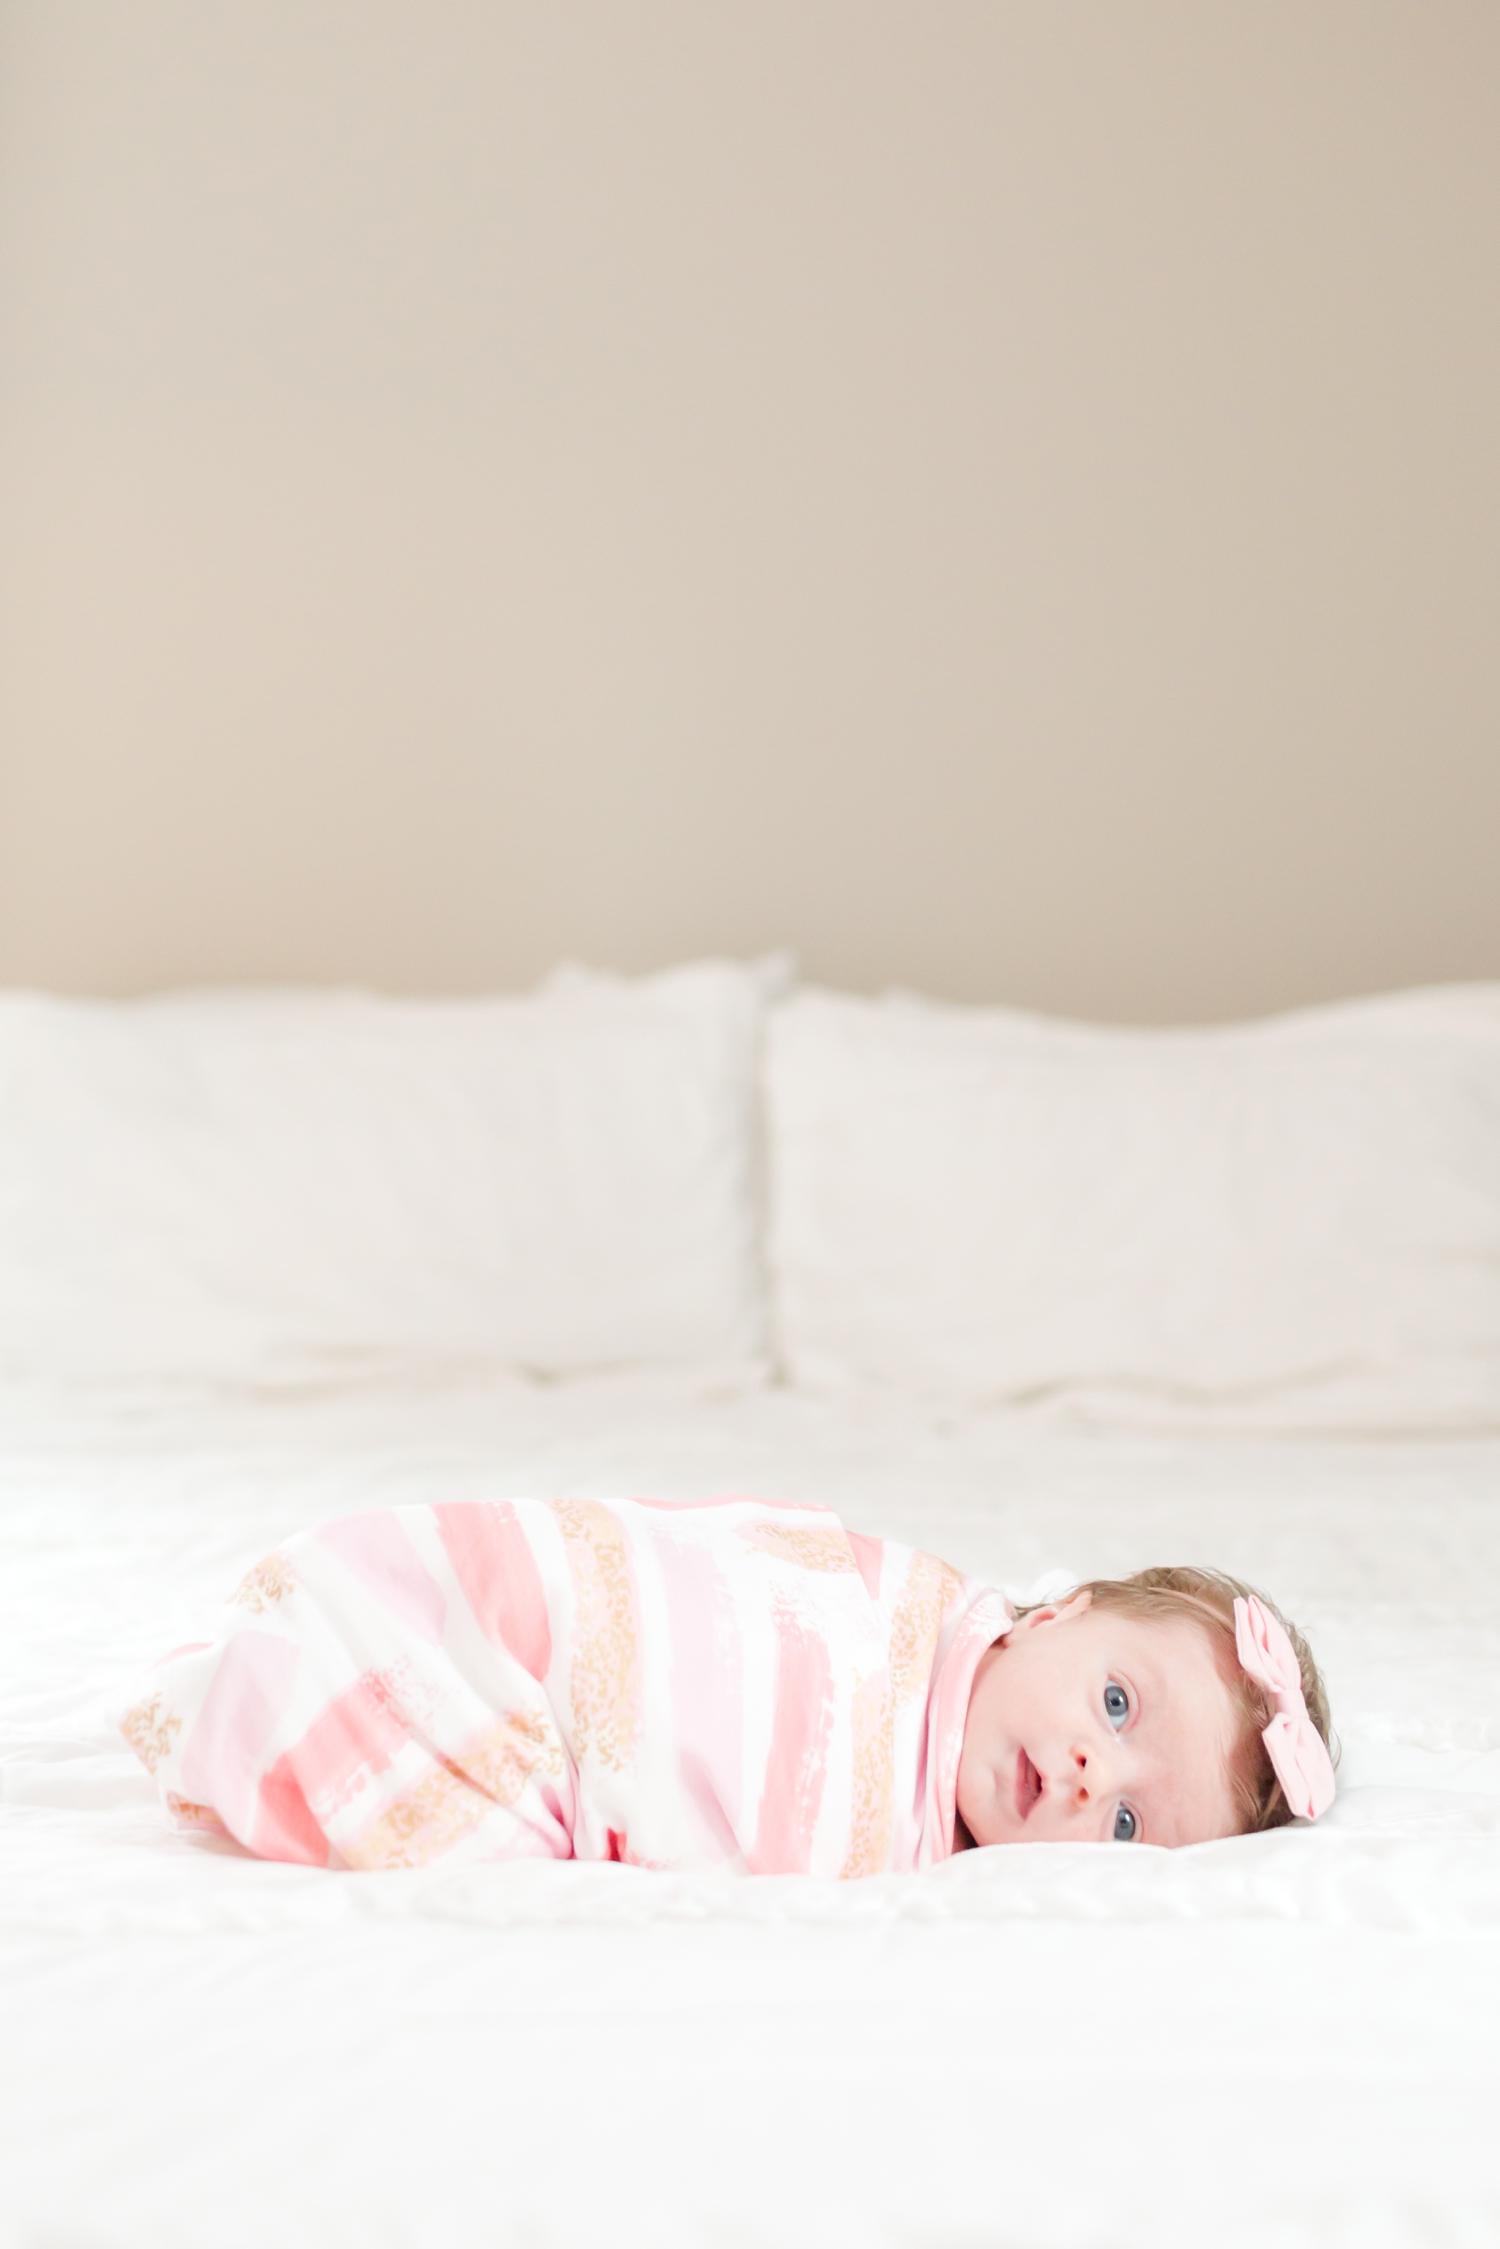 Miano Newborn-108_anna grace photography newborn photography baltimore maryland newborn and family photographer photo.jpg